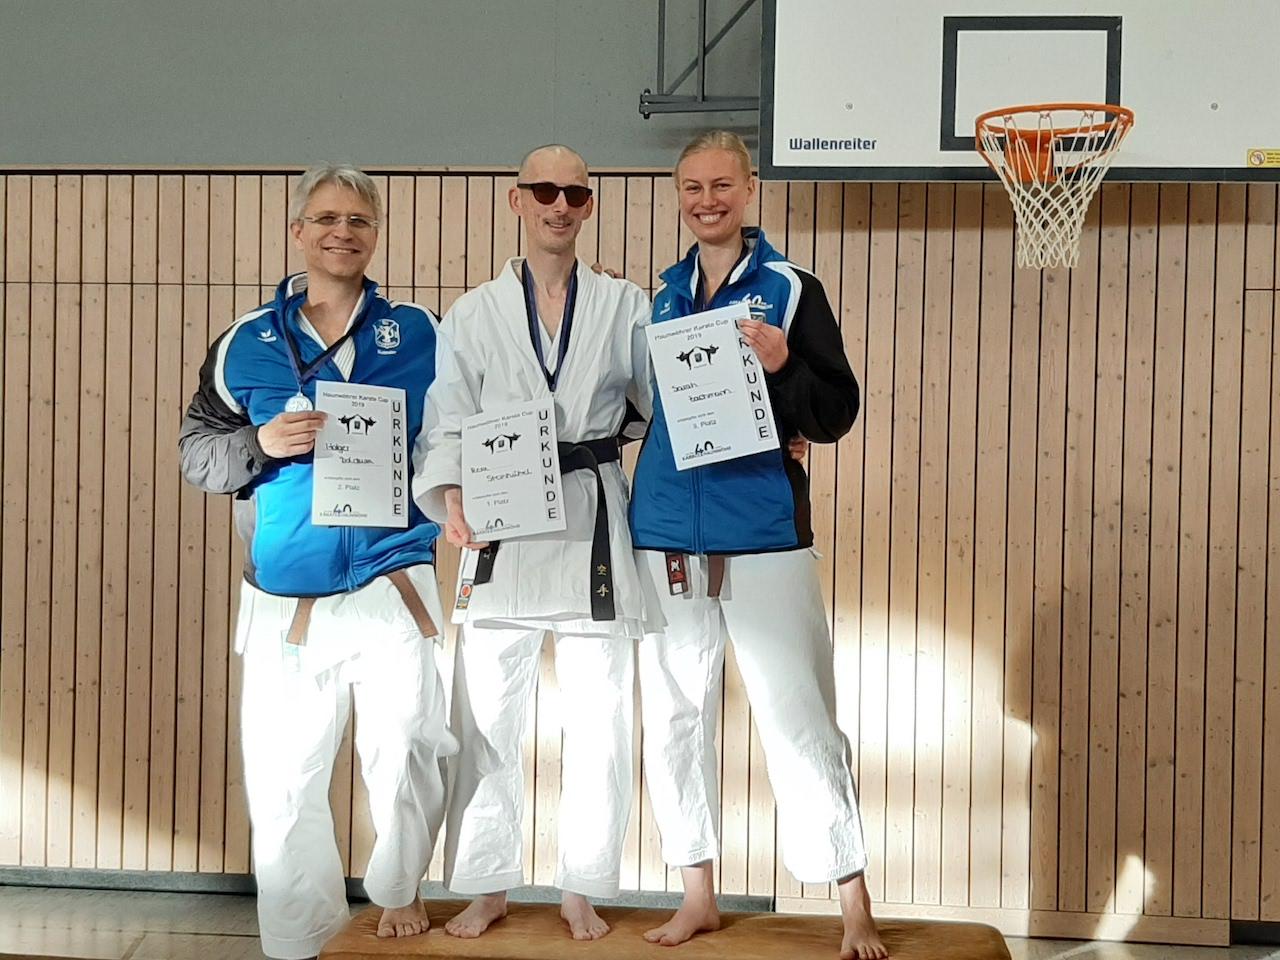 Haunwöhrer Karate Cup 2019 - Karate SV Ingolstadt - Haunwöhr